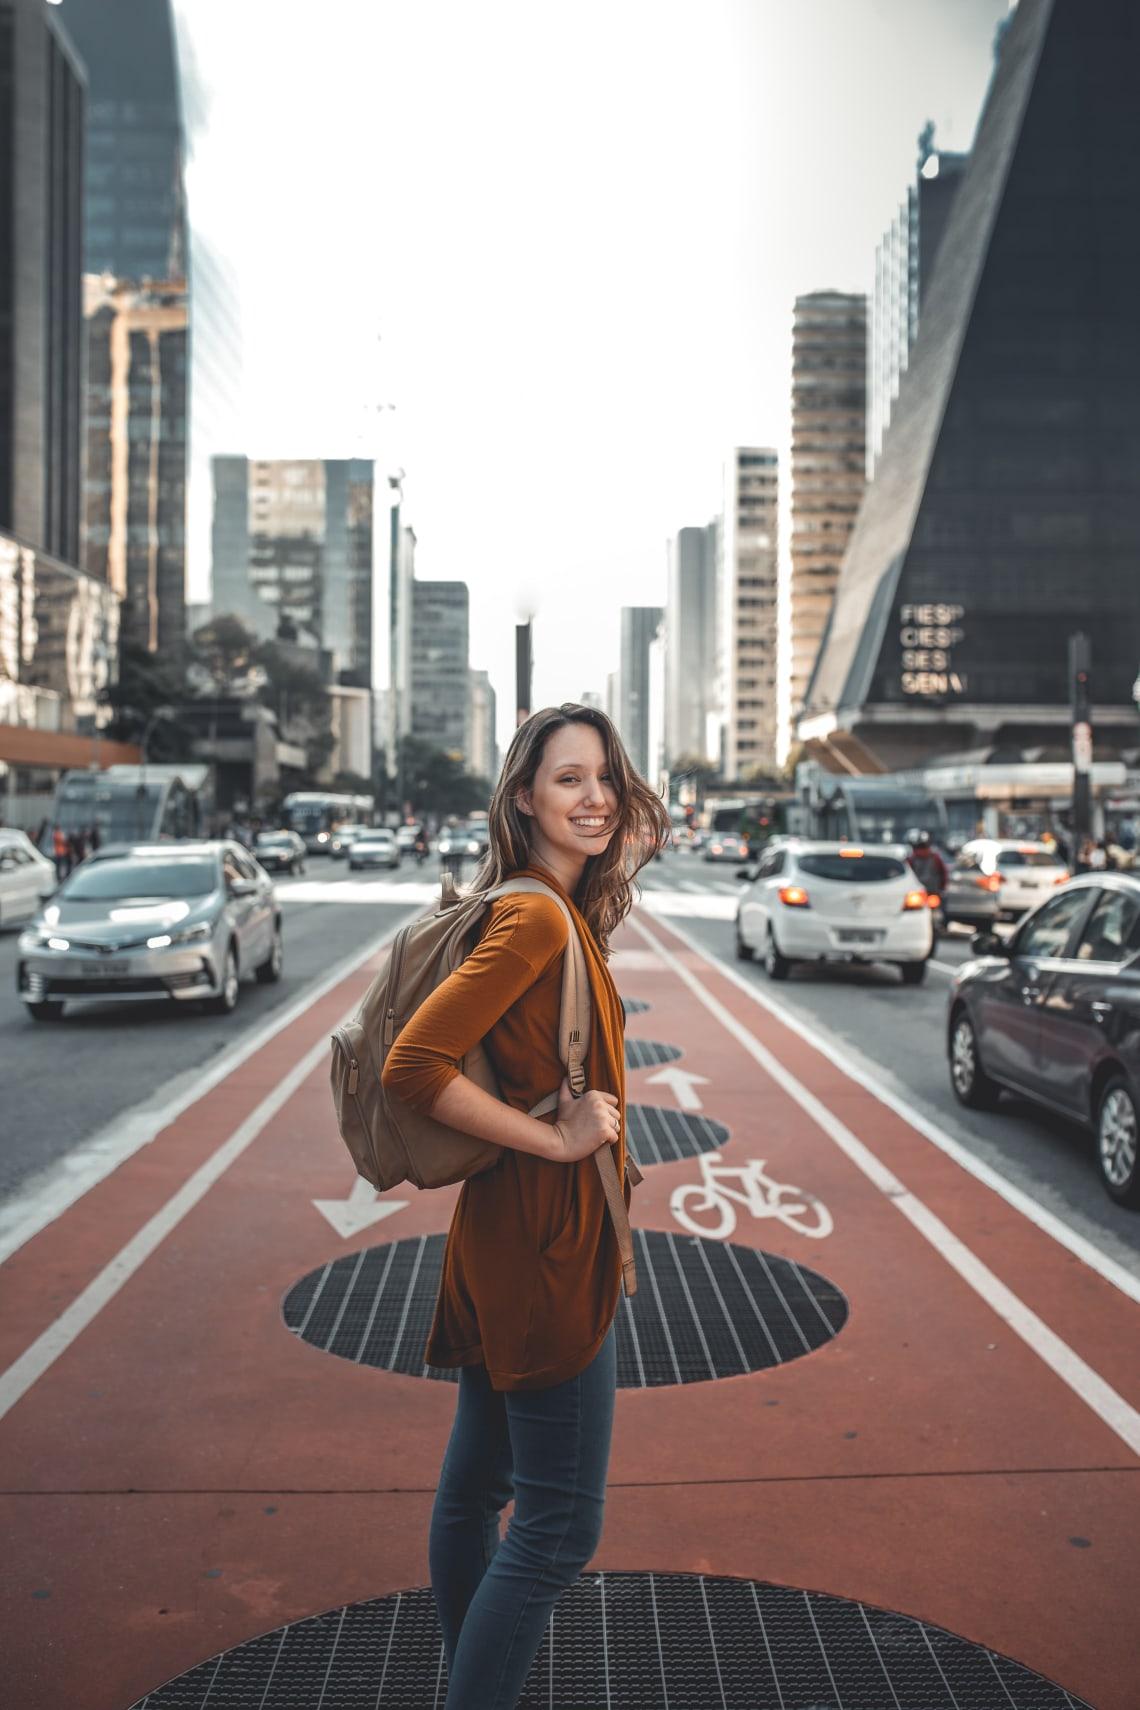 Solo female traveler exploring a new city